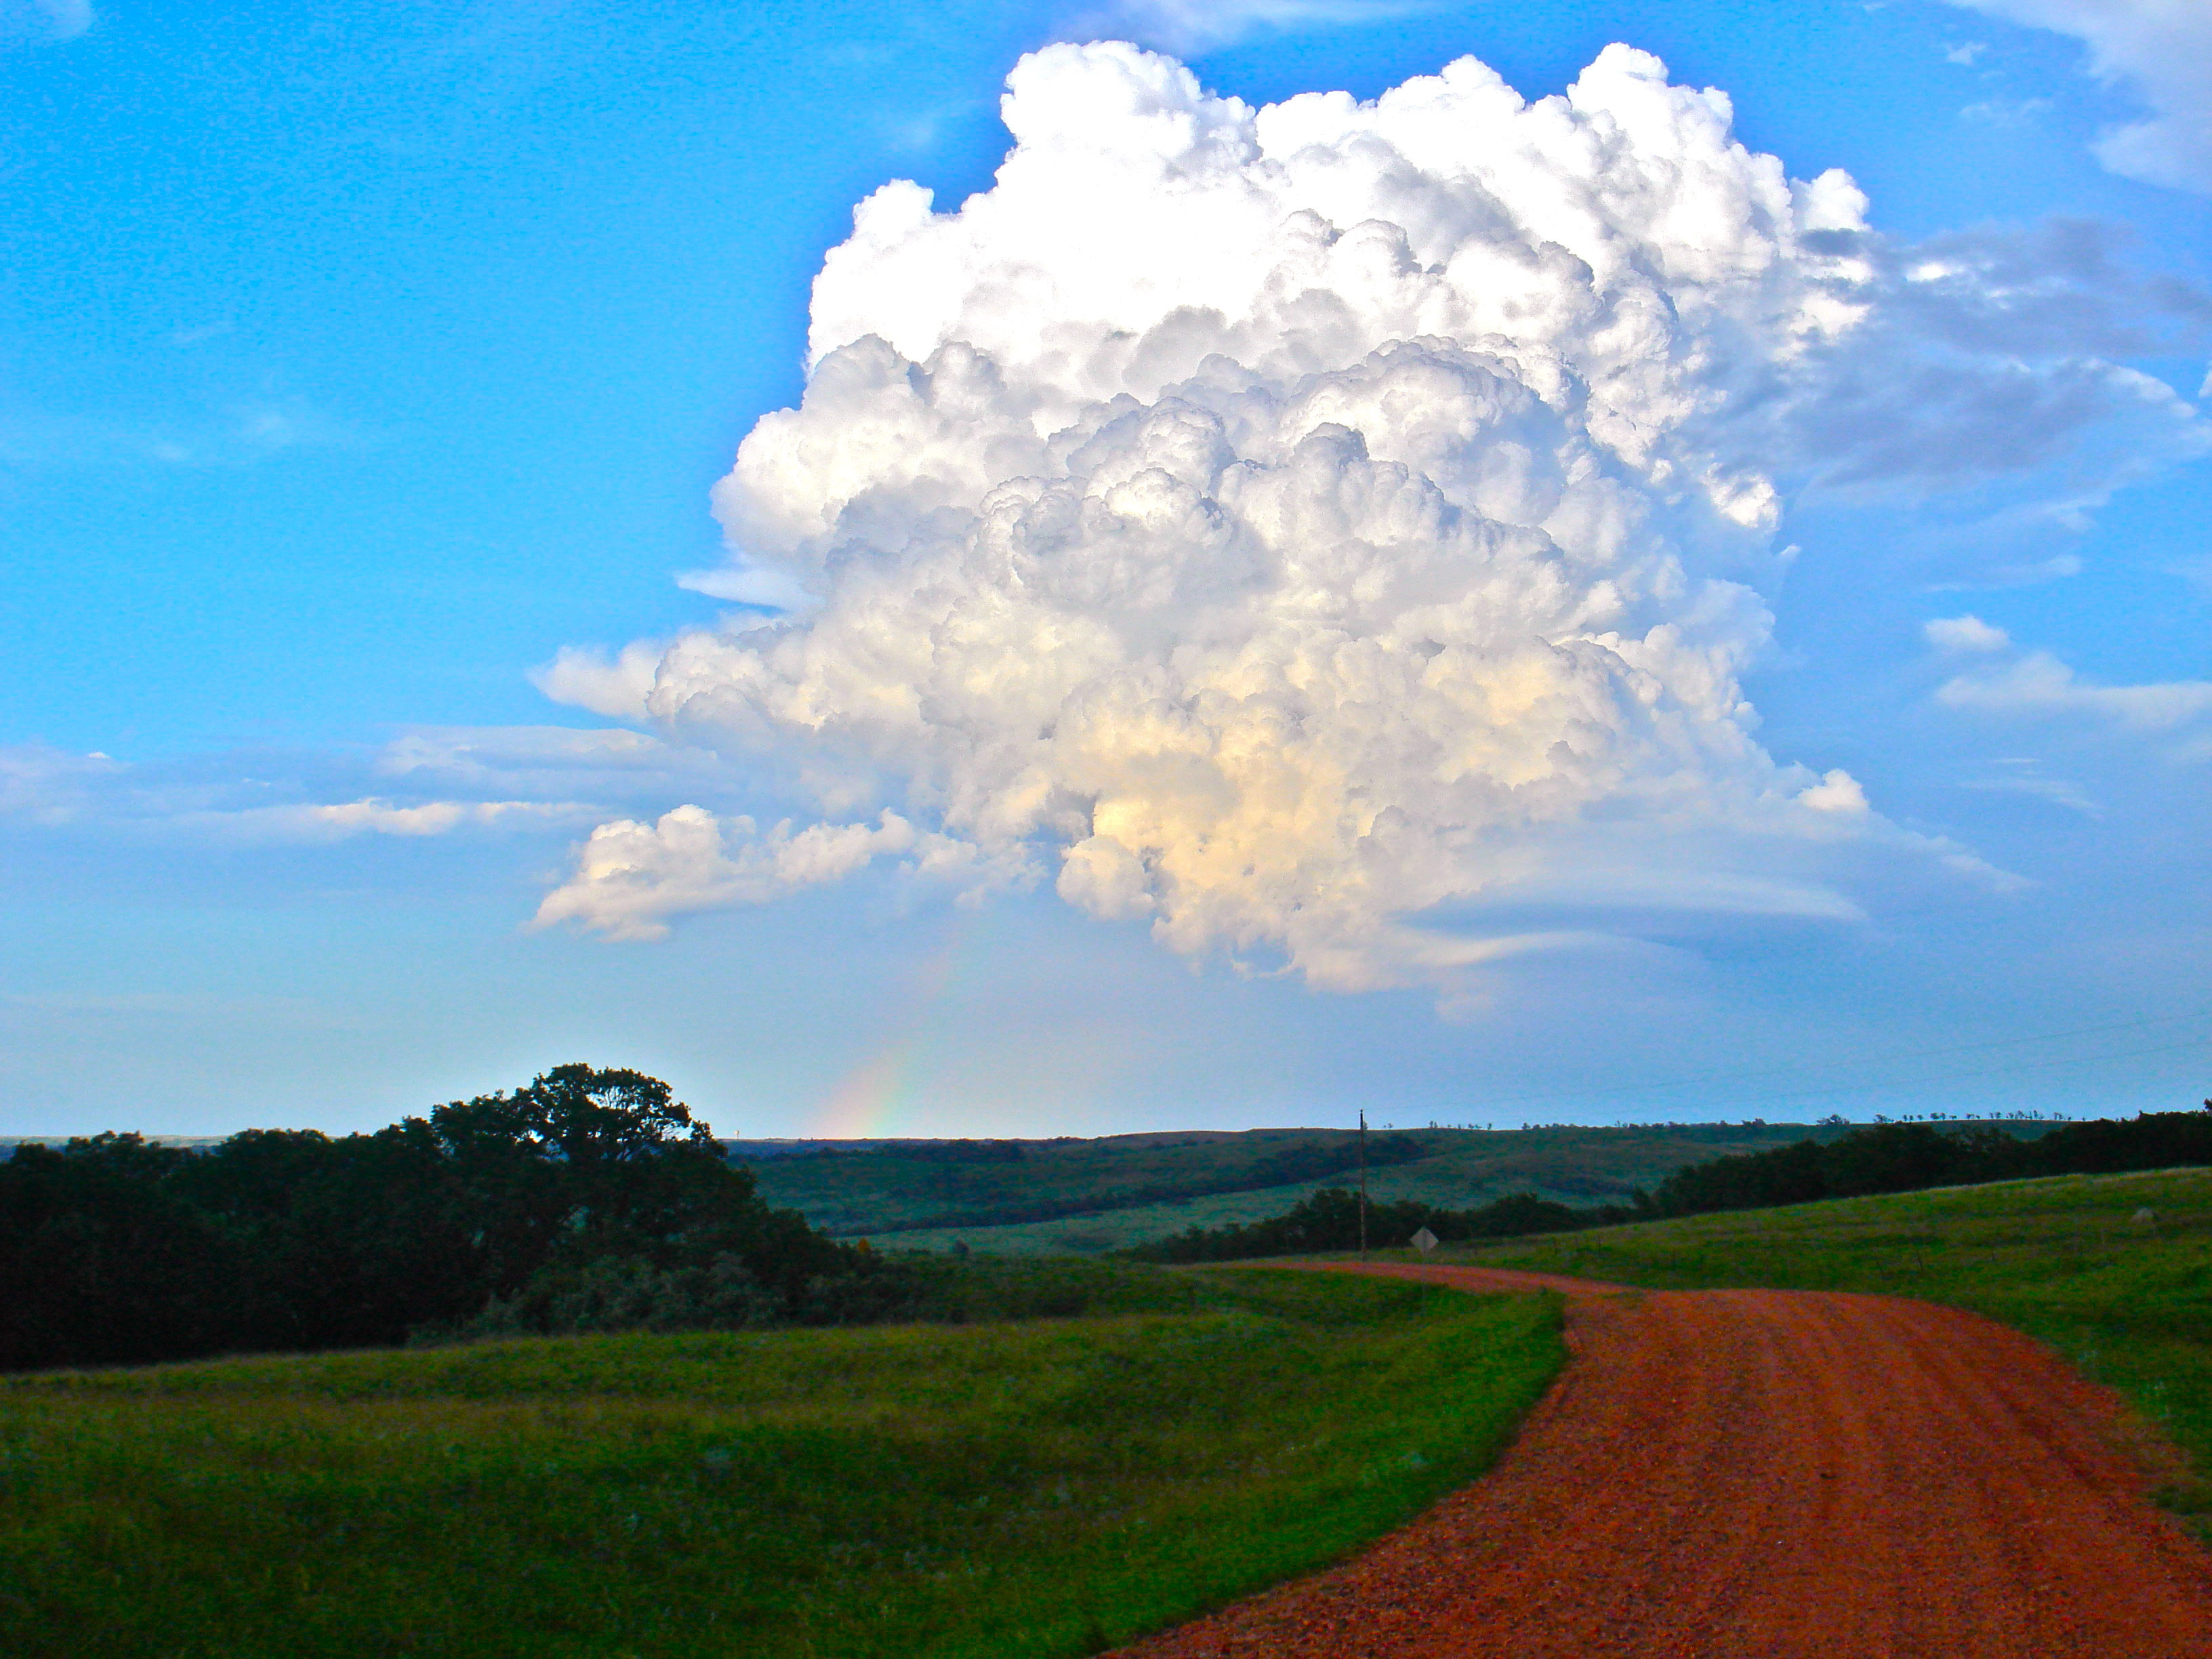 Storm cloud and rainbow